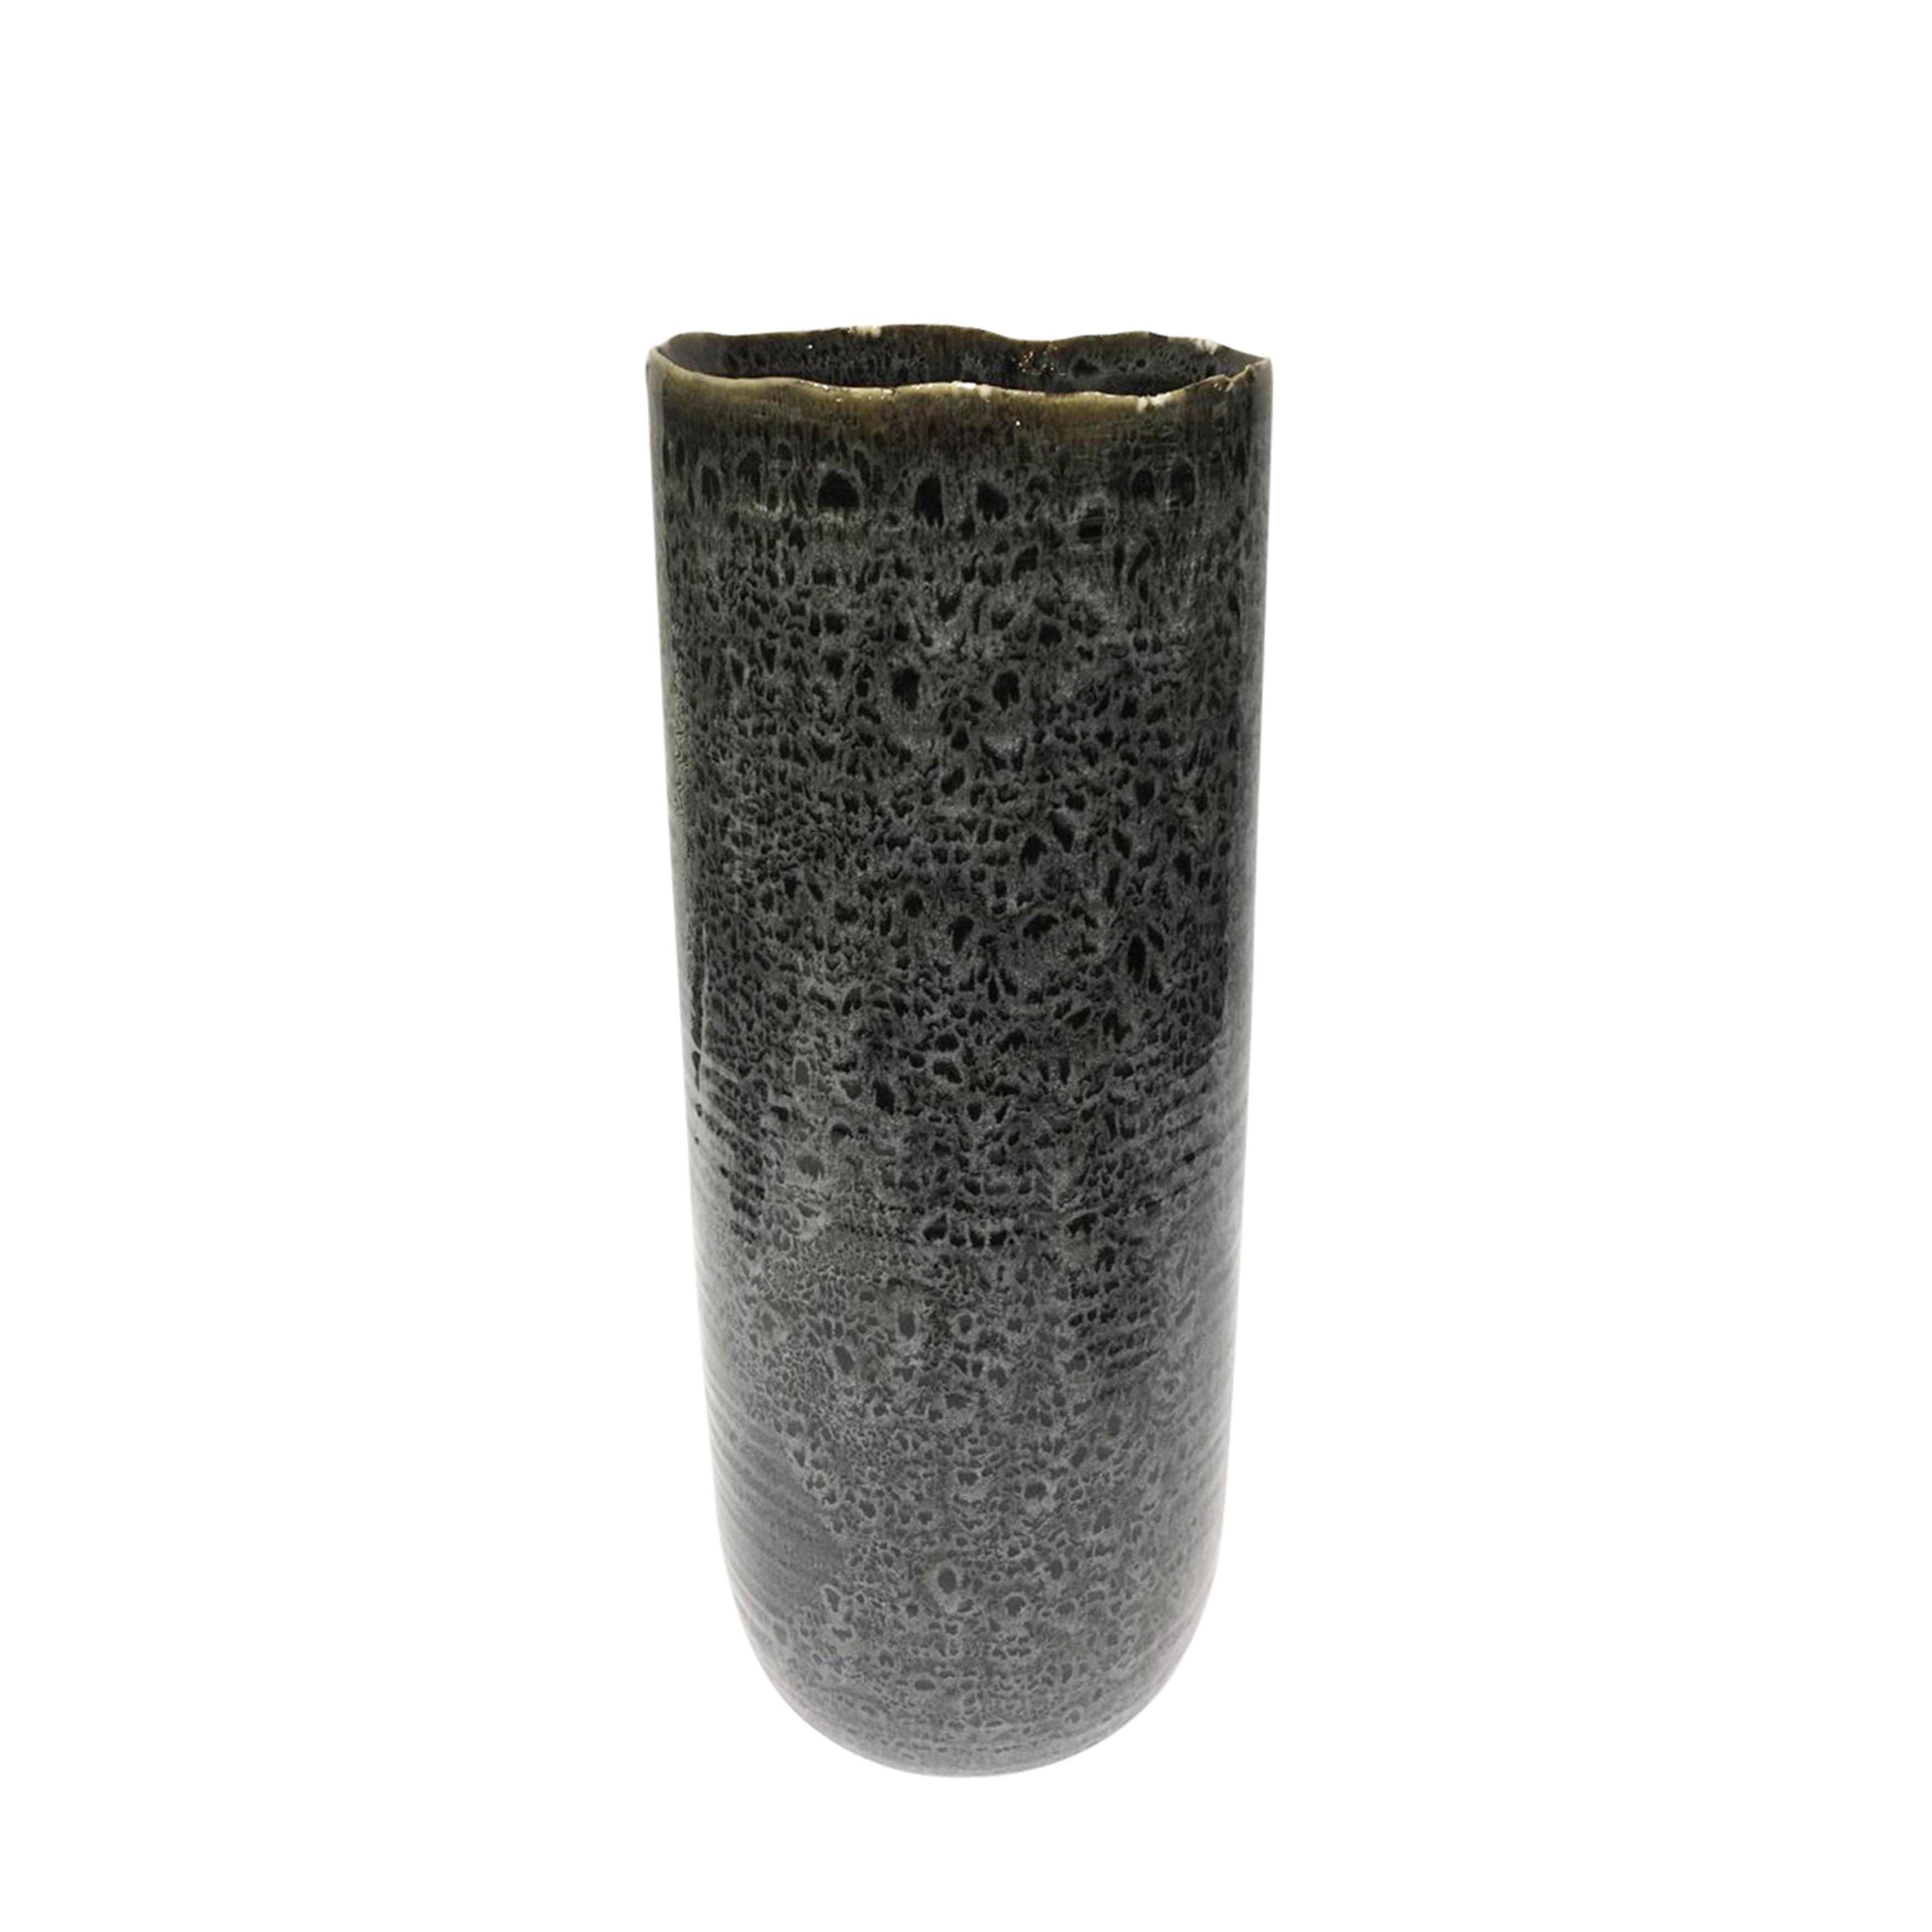 Ceramic Tapered Vase with Asymmetrical Rim, Large, Black